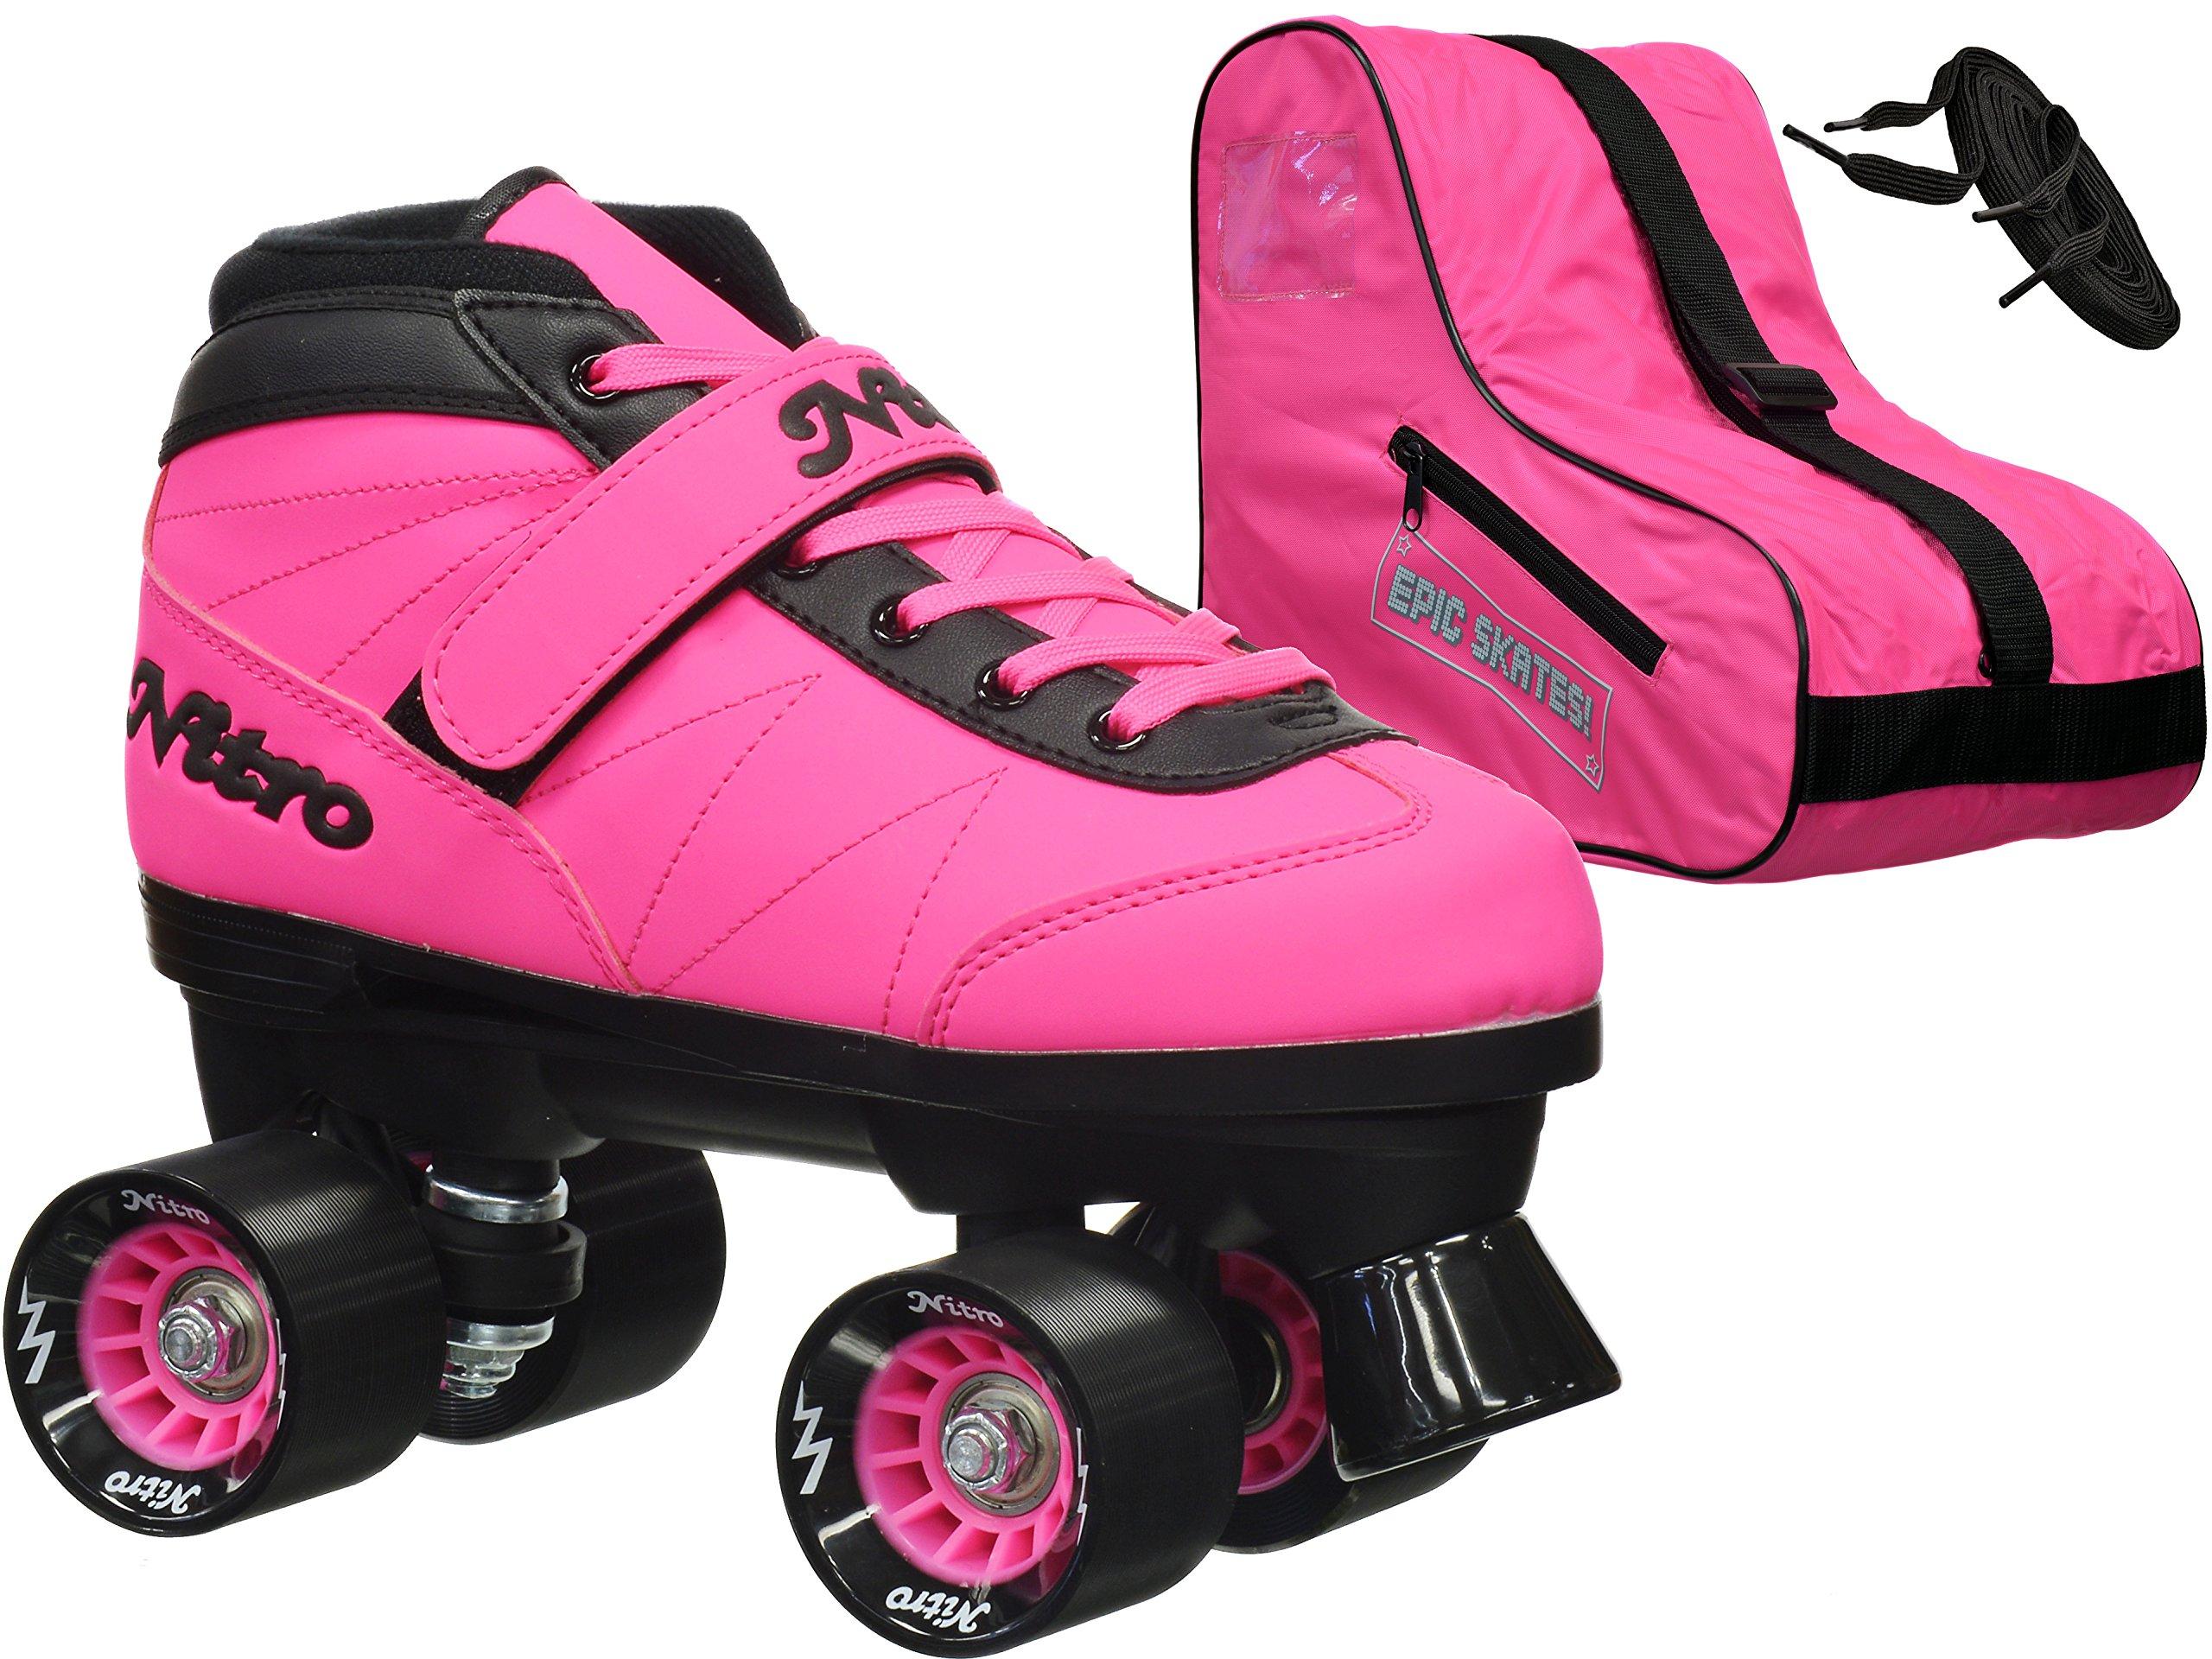 New! 2016 Epic Nitro Turbo Pink Indoor / Outdoor Quad Roller Speed Skates Bundle (Mens 6)